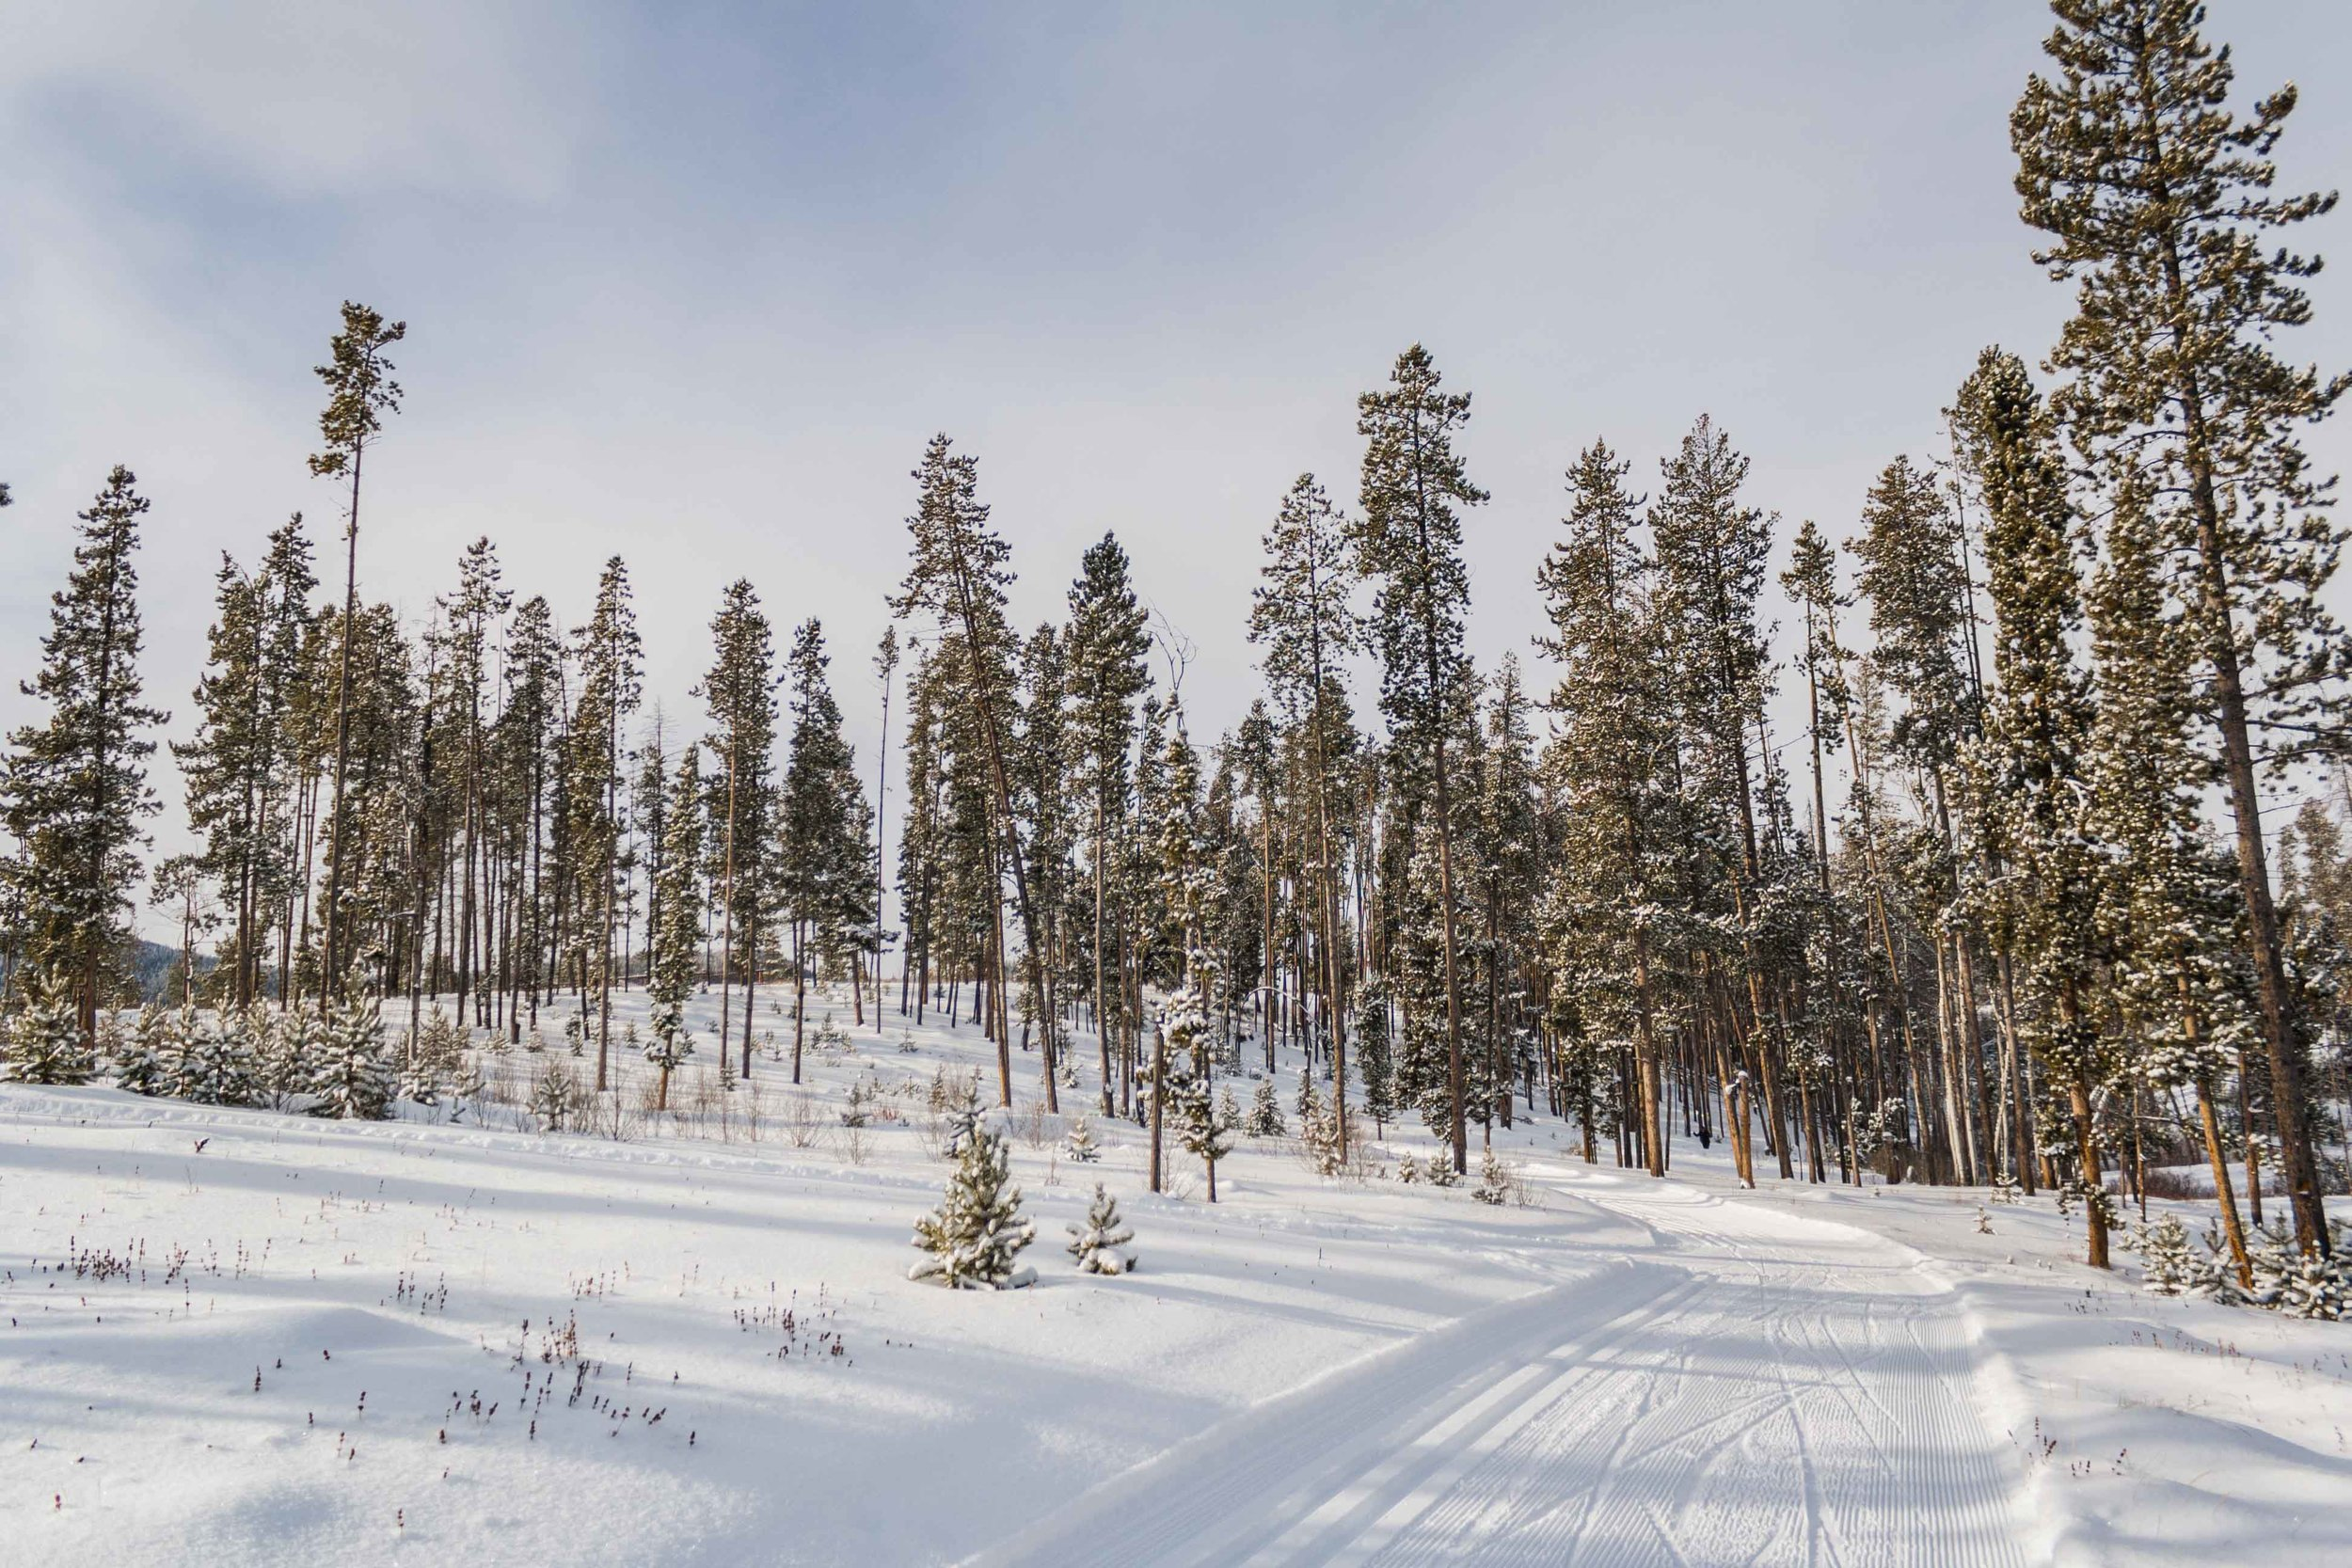 Homestake Pass, Montana. December 2016